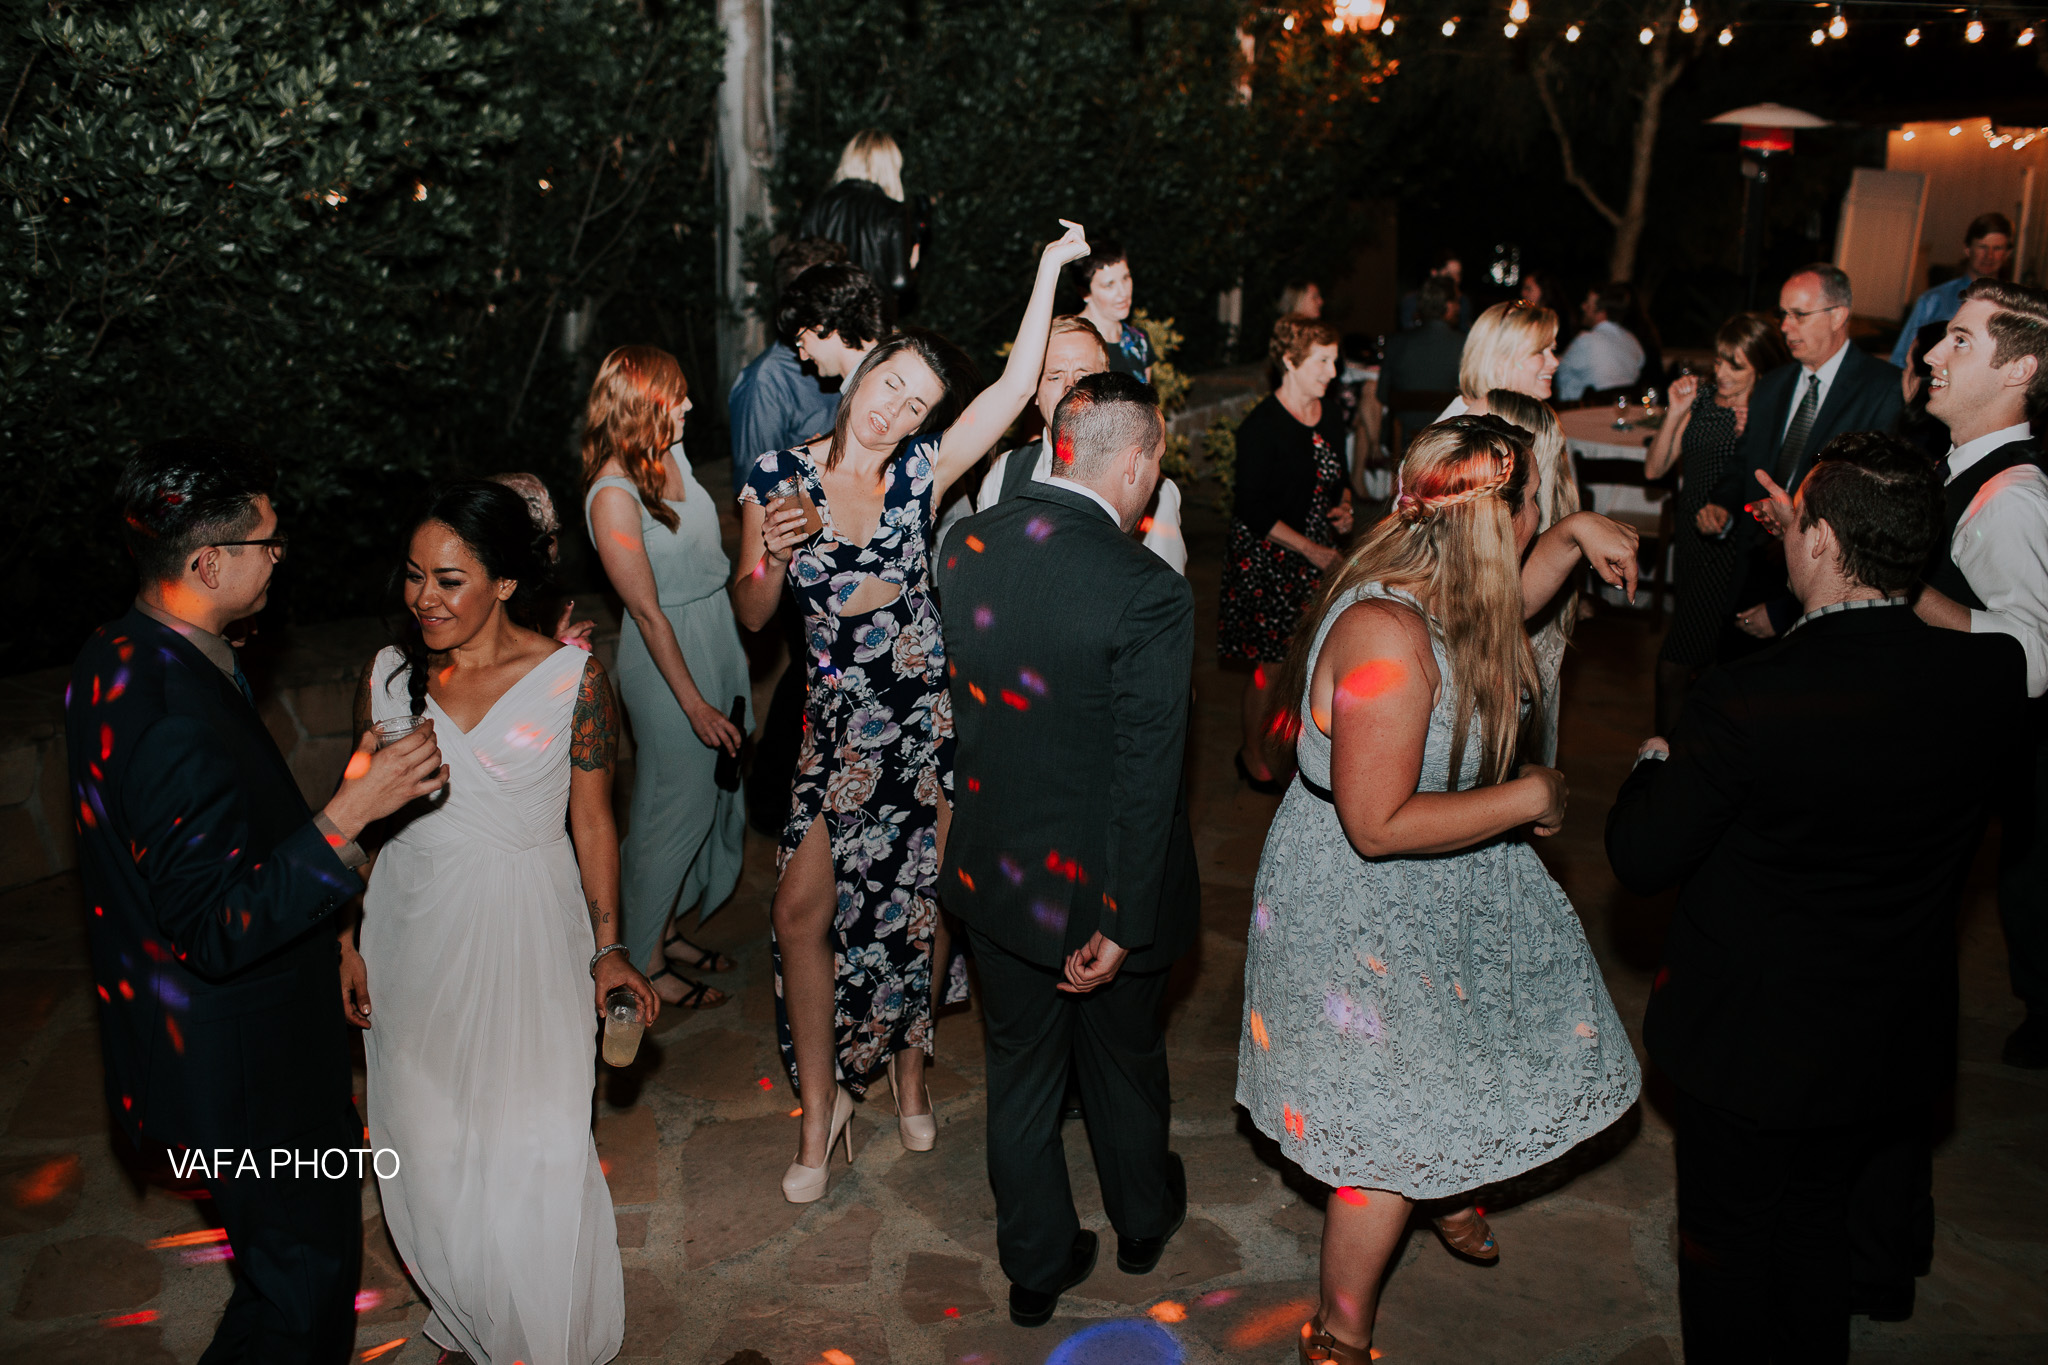 Leo-Carrillo-Ranch-Wedding-Lauren-Mike-Vafa-Photo-1190.jpg